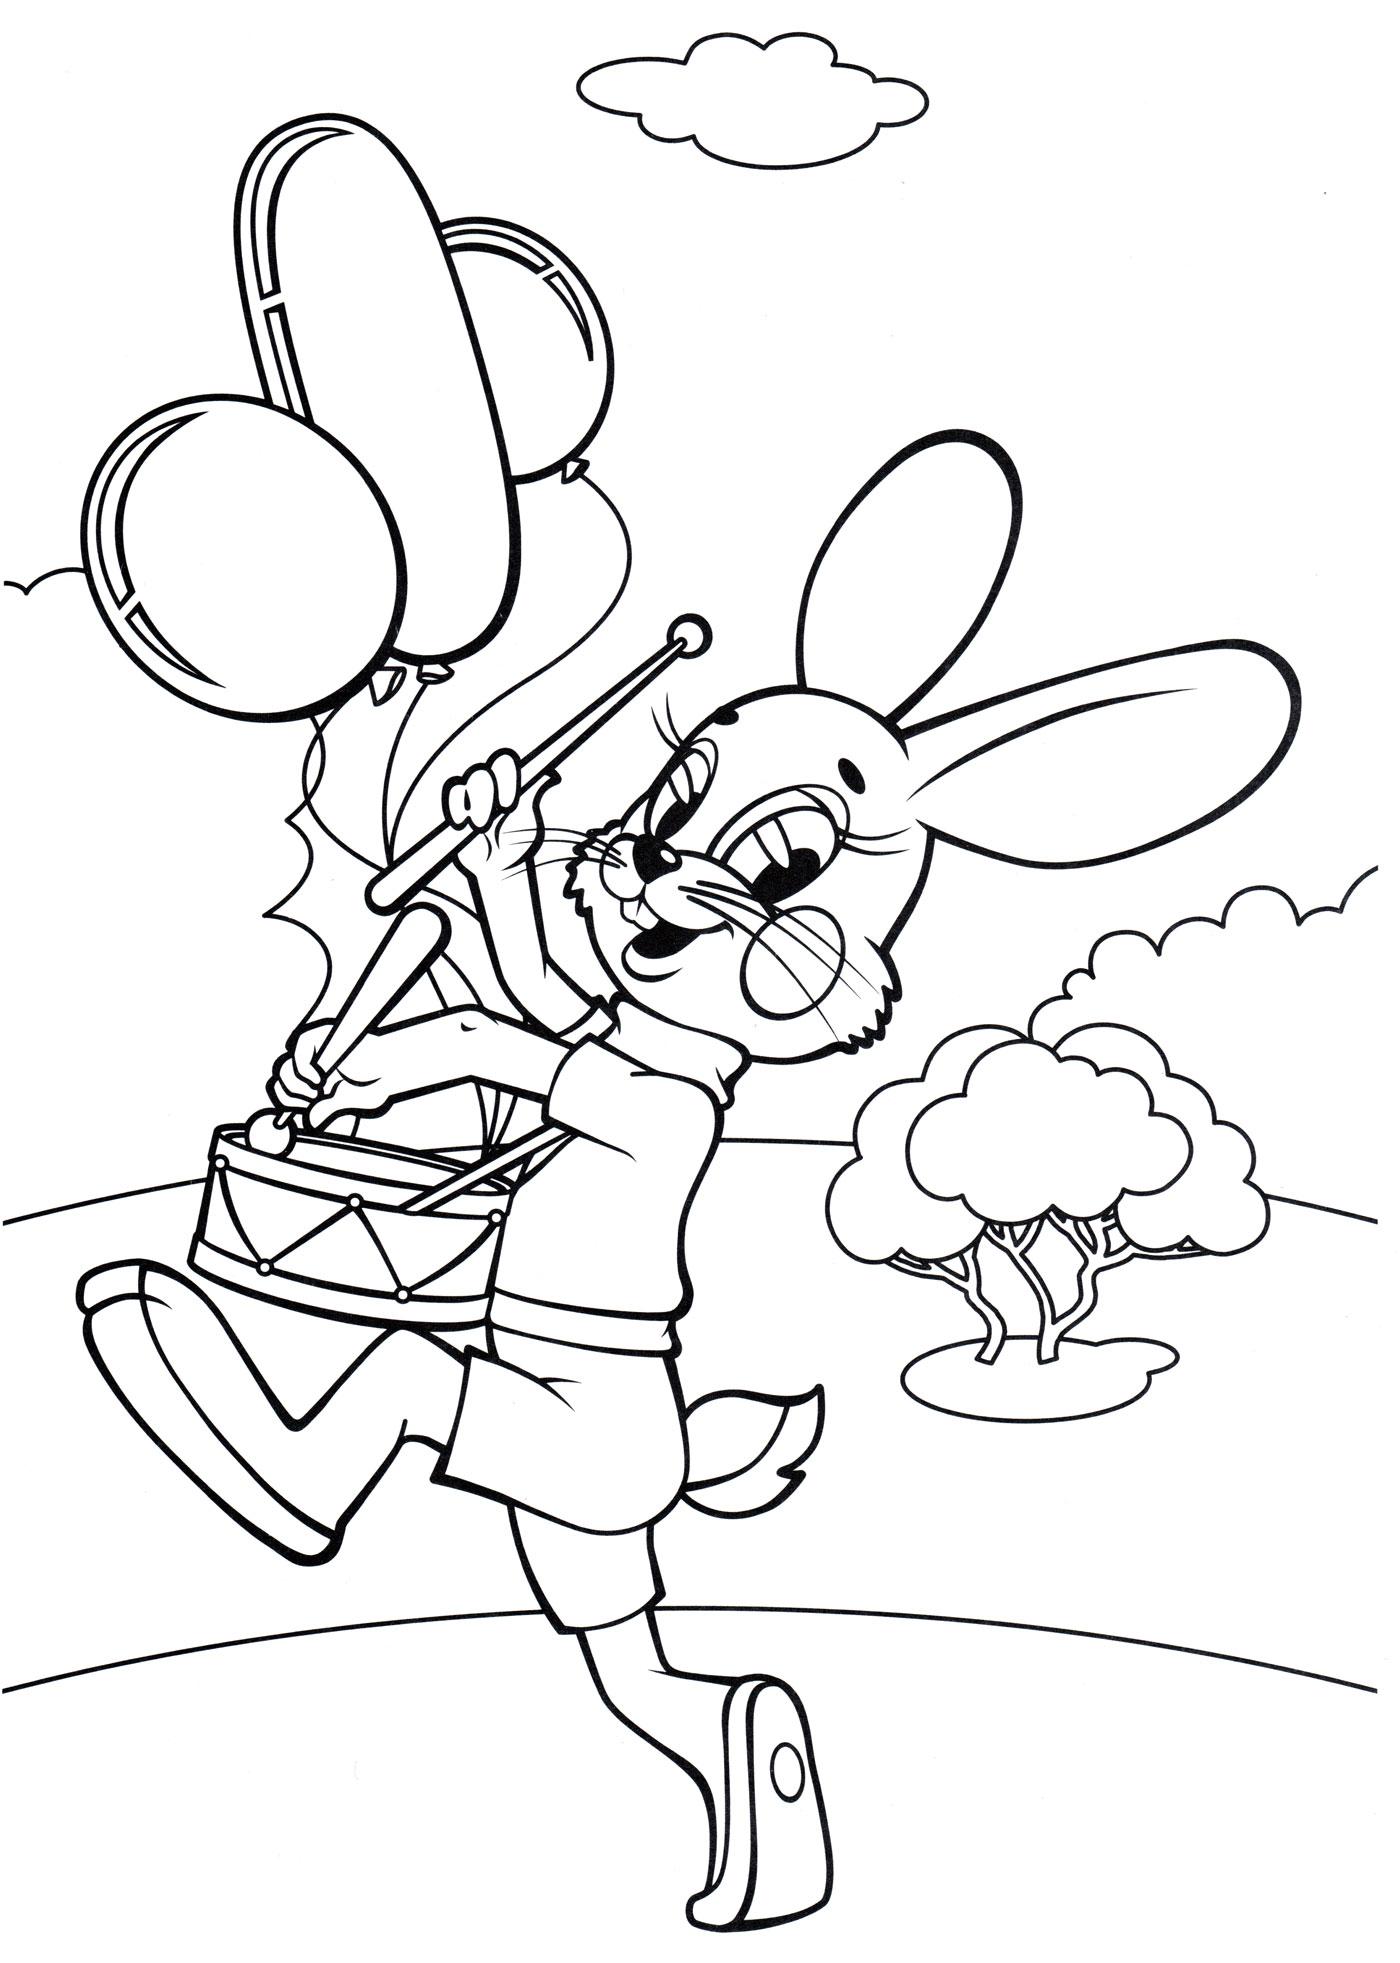 Заяц из ну погоди раскраска